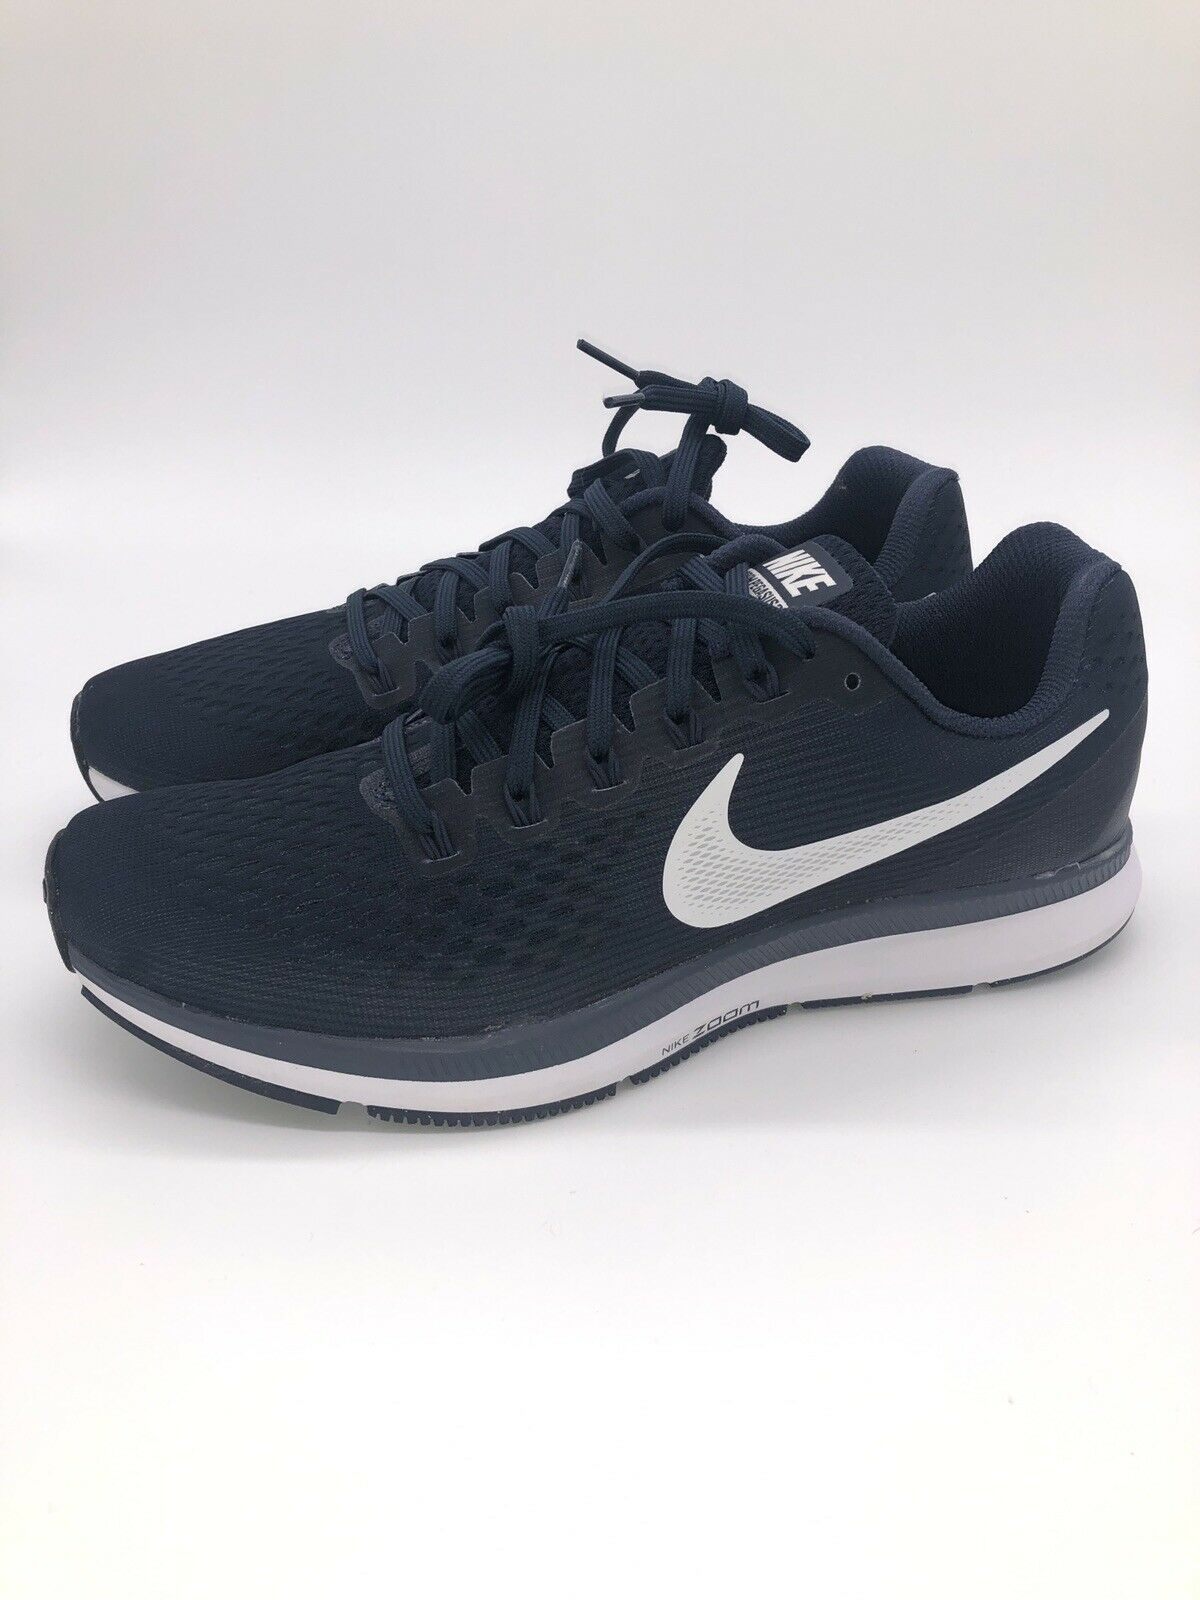 2ca7eadfe4249 Nike 880555-407 Men s Men s Men s Air Zoom Pegasus 34 Running shoes Size 9  479bc5